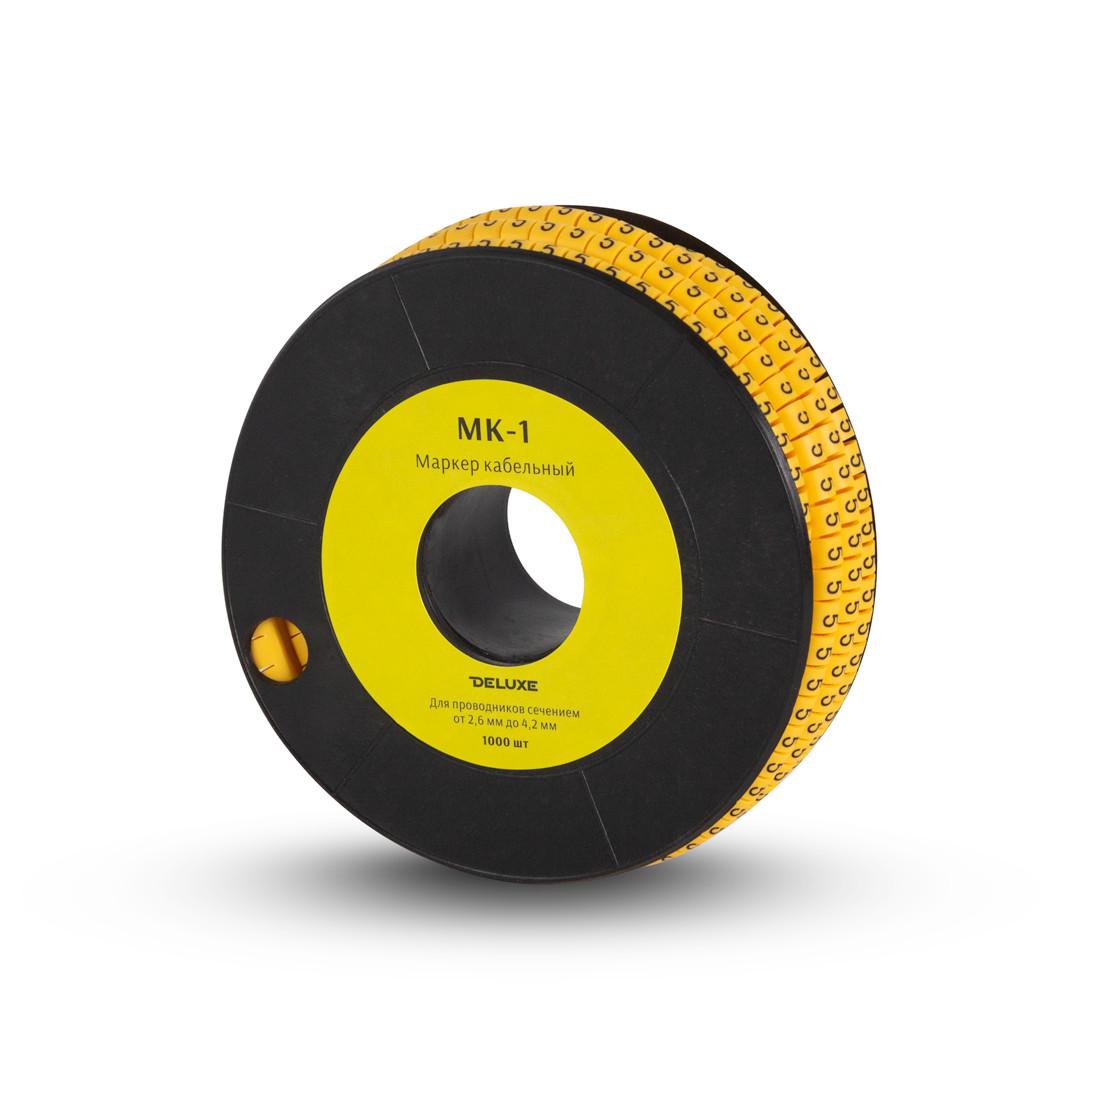 "Маркер кабельный Deluxe МК-1 (2.6-42 мм) символ ""9"" (1000 шт/упак.)"